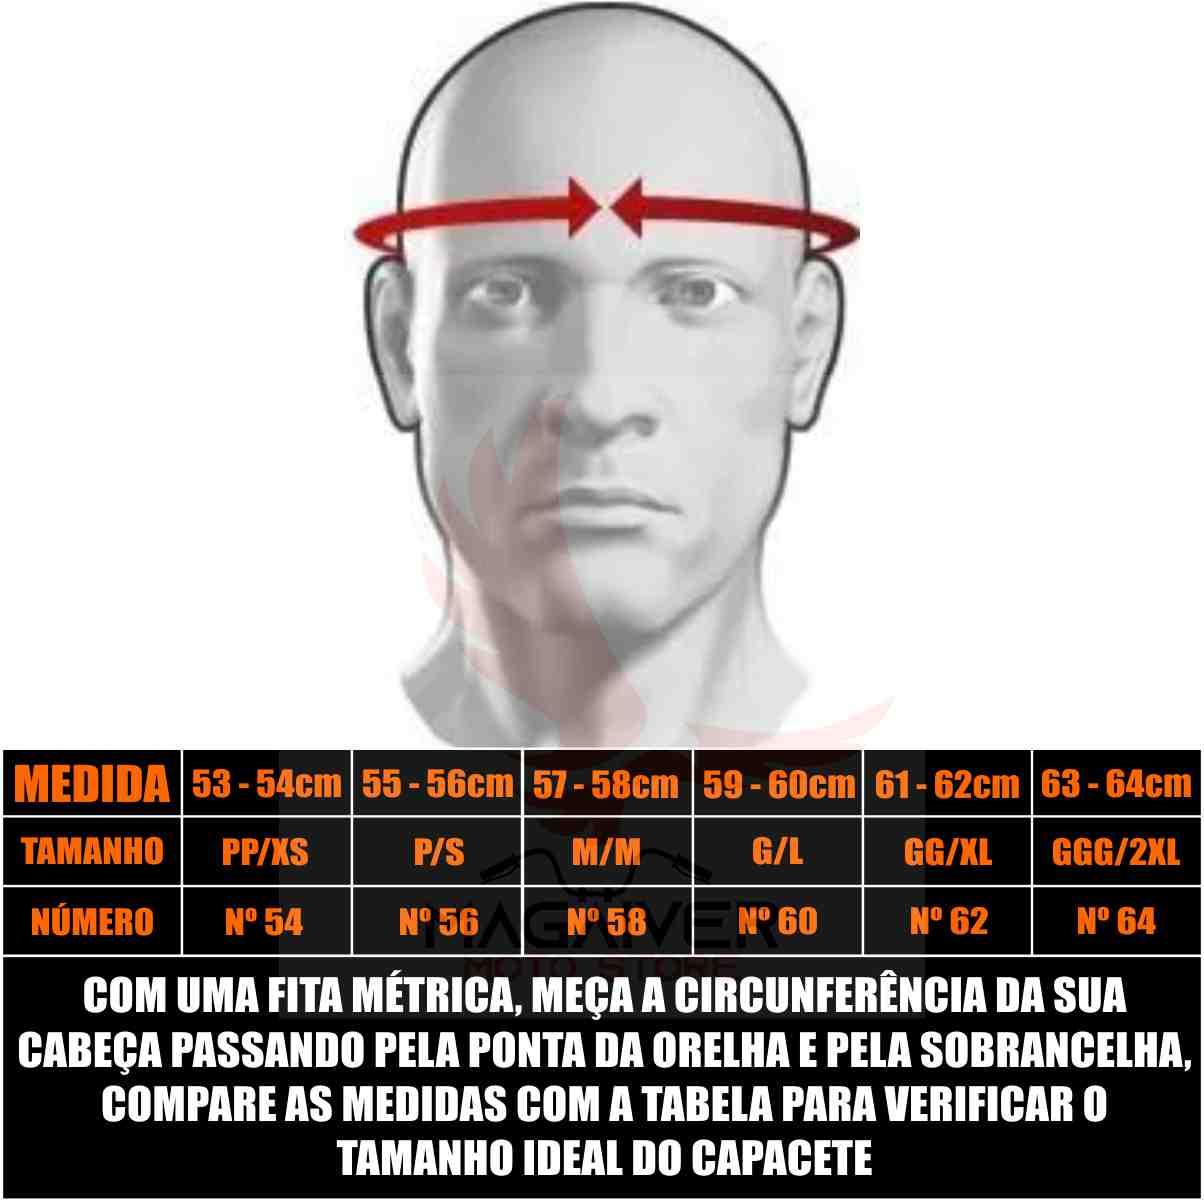 COMBO CAPACETE ABERTO CUSTOM REVESTIDO COURO CLASSICO RETRÔ VISOR CRISTAL + 1 VISEIRA EXTRA SILVER